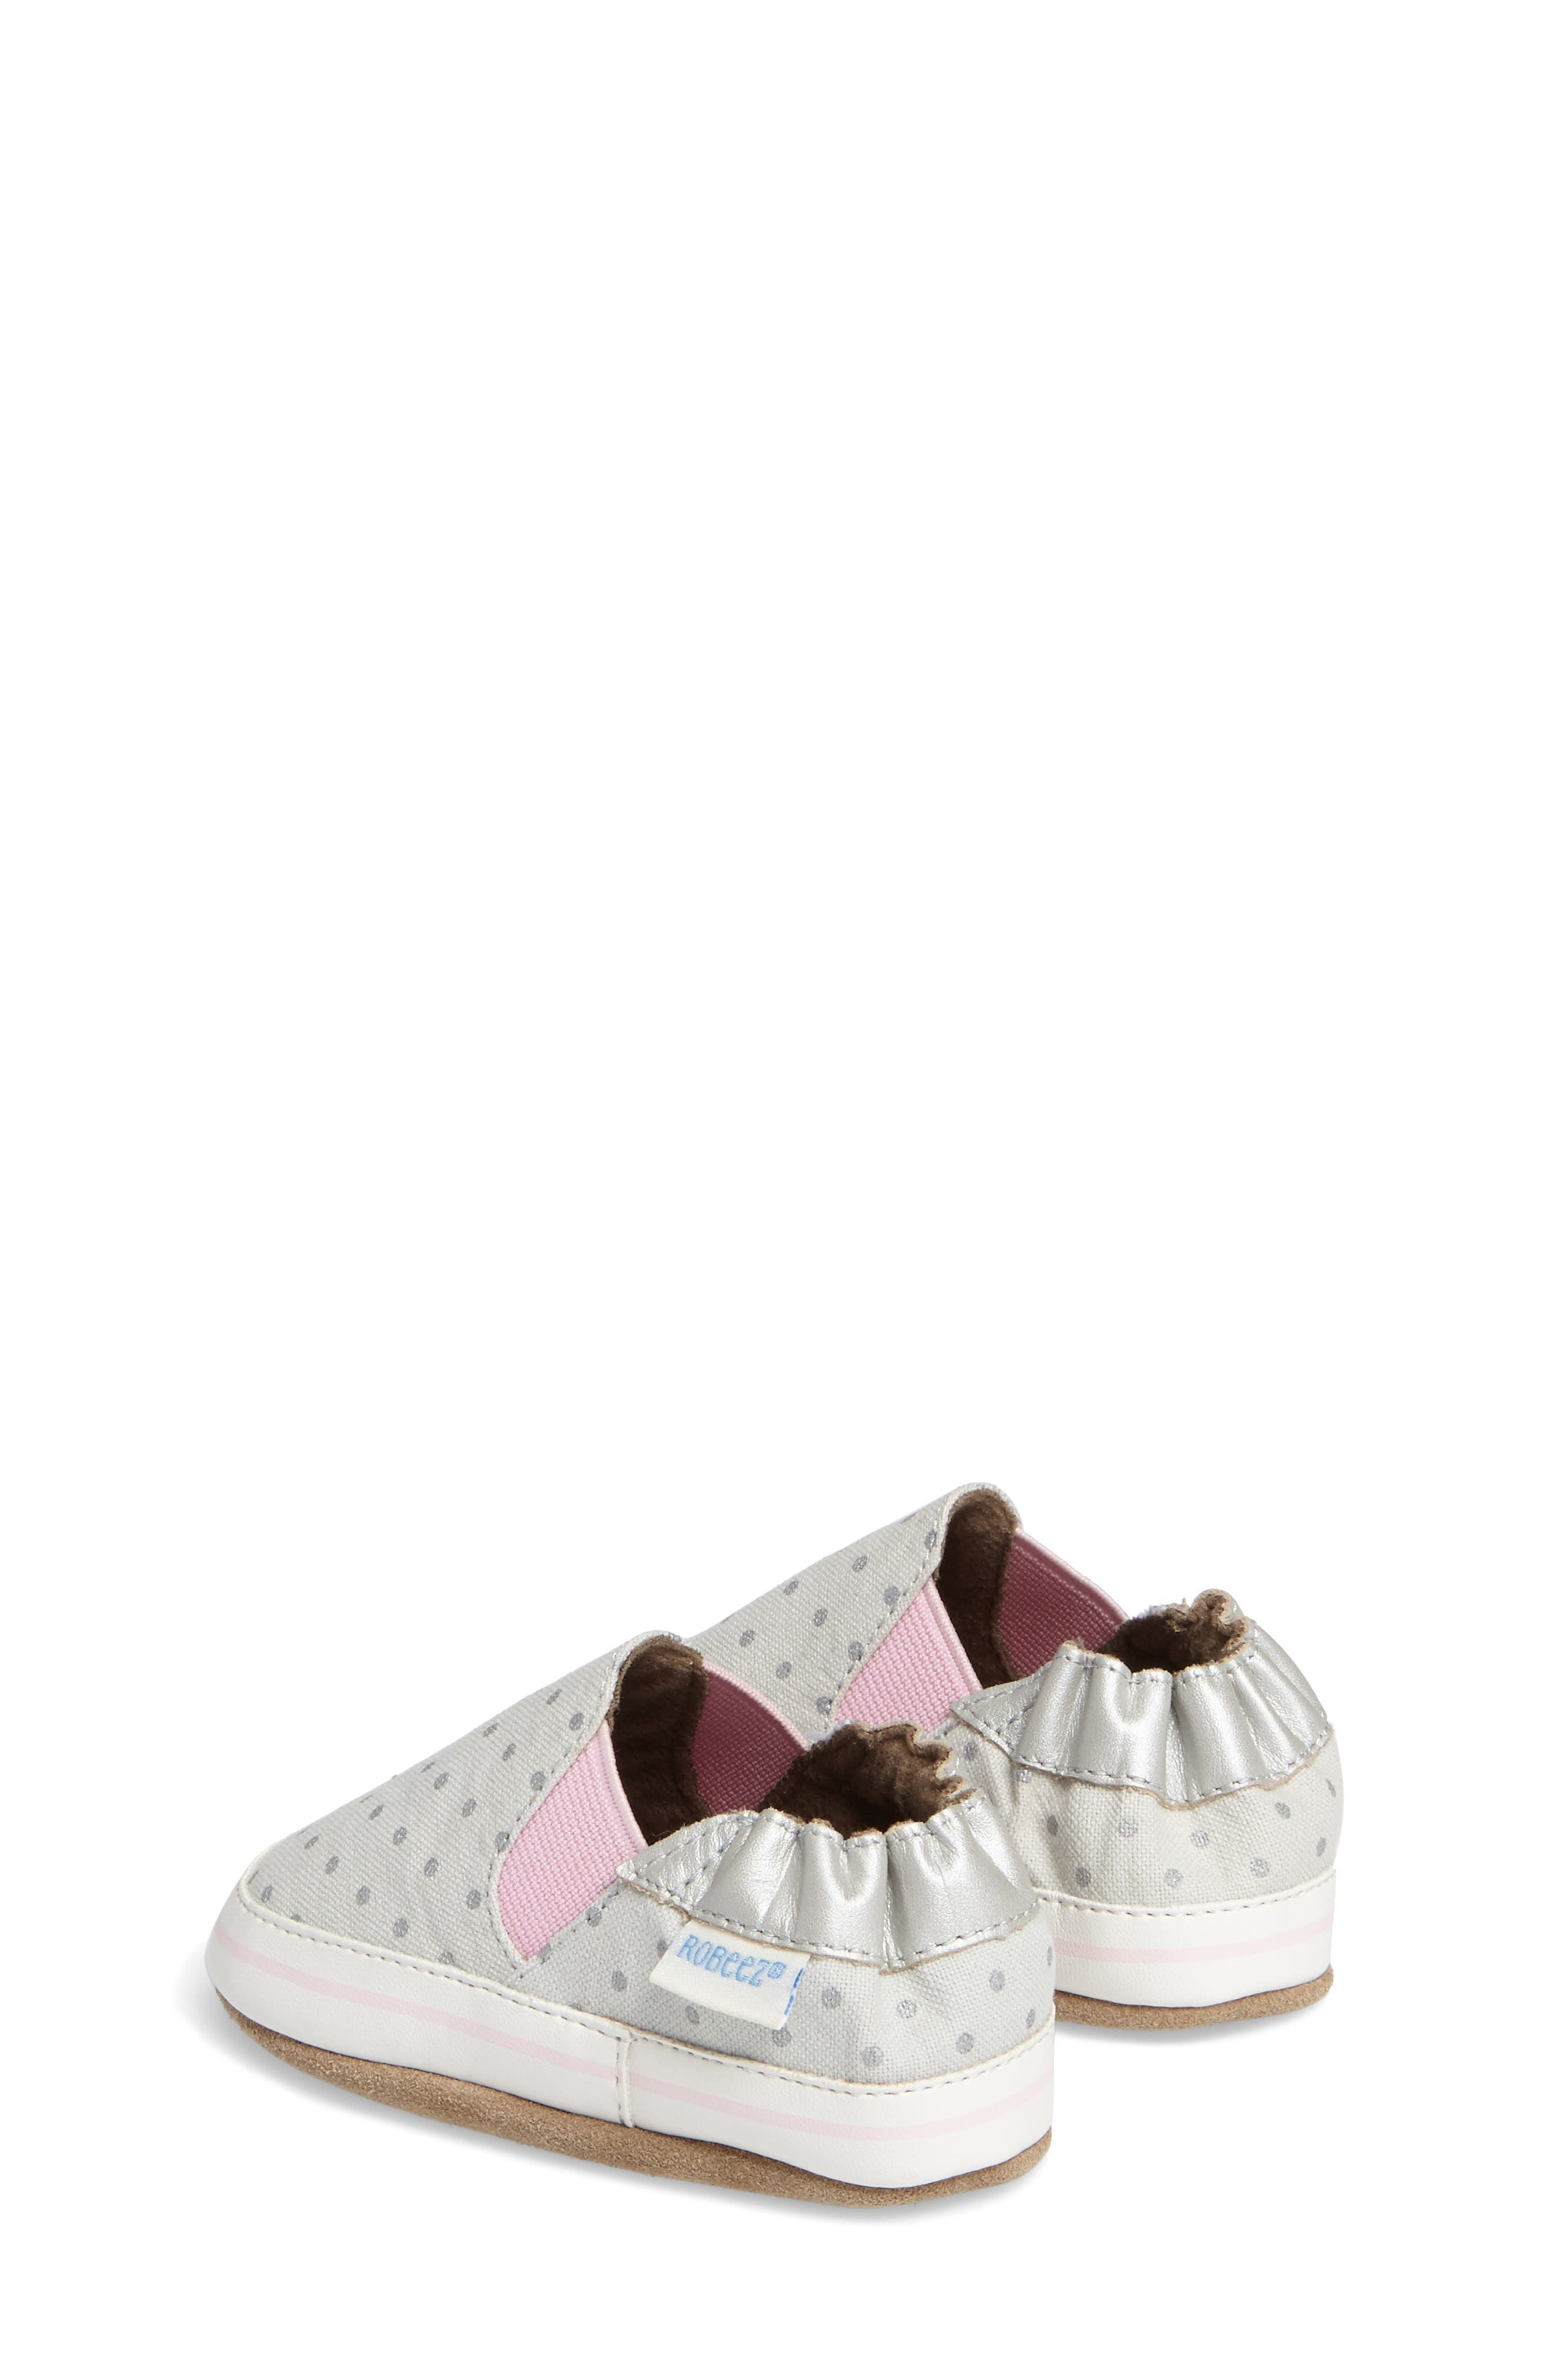 Dot Mania Crib Shoe,                             Alternate thumbnail 2, color,                             METALLIC GREY LEATHER